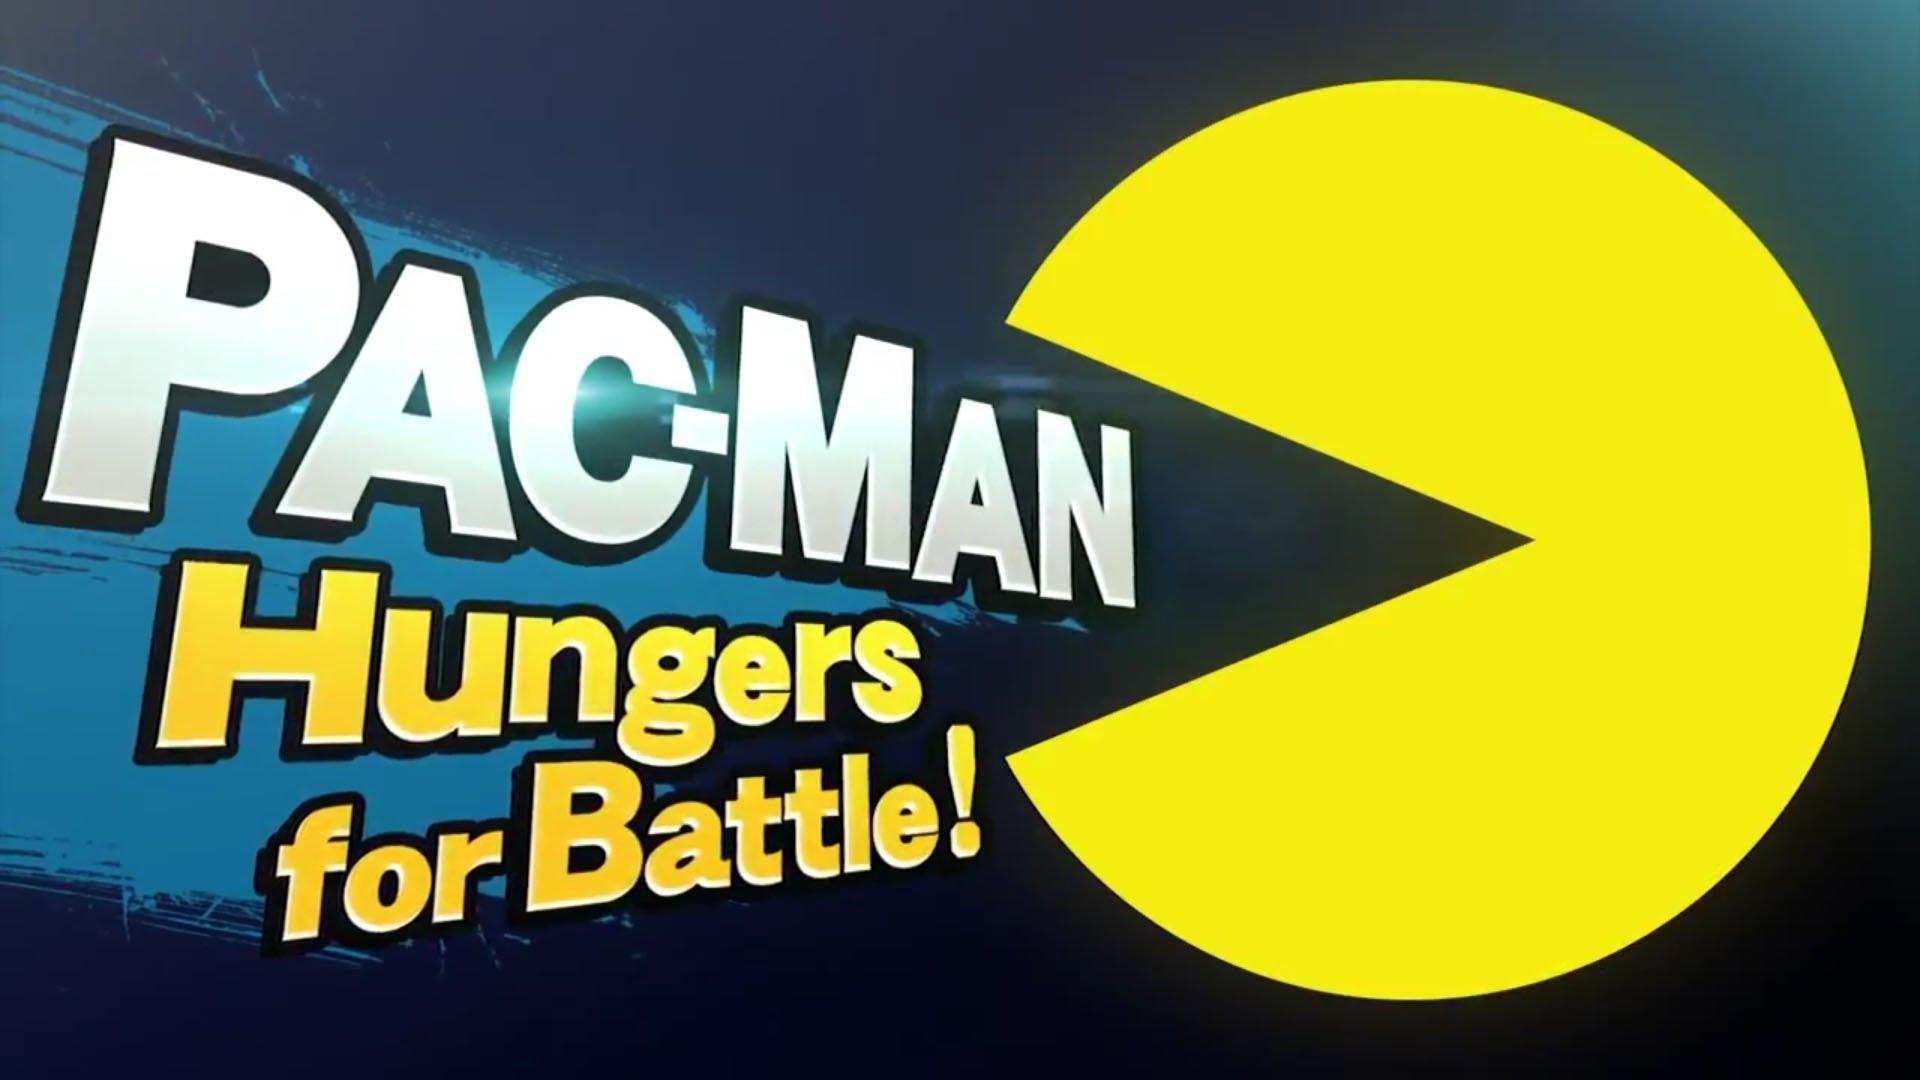 Favorite Image - Pac man hungers for battle.png | Smashpedia | FANDOM  XA46